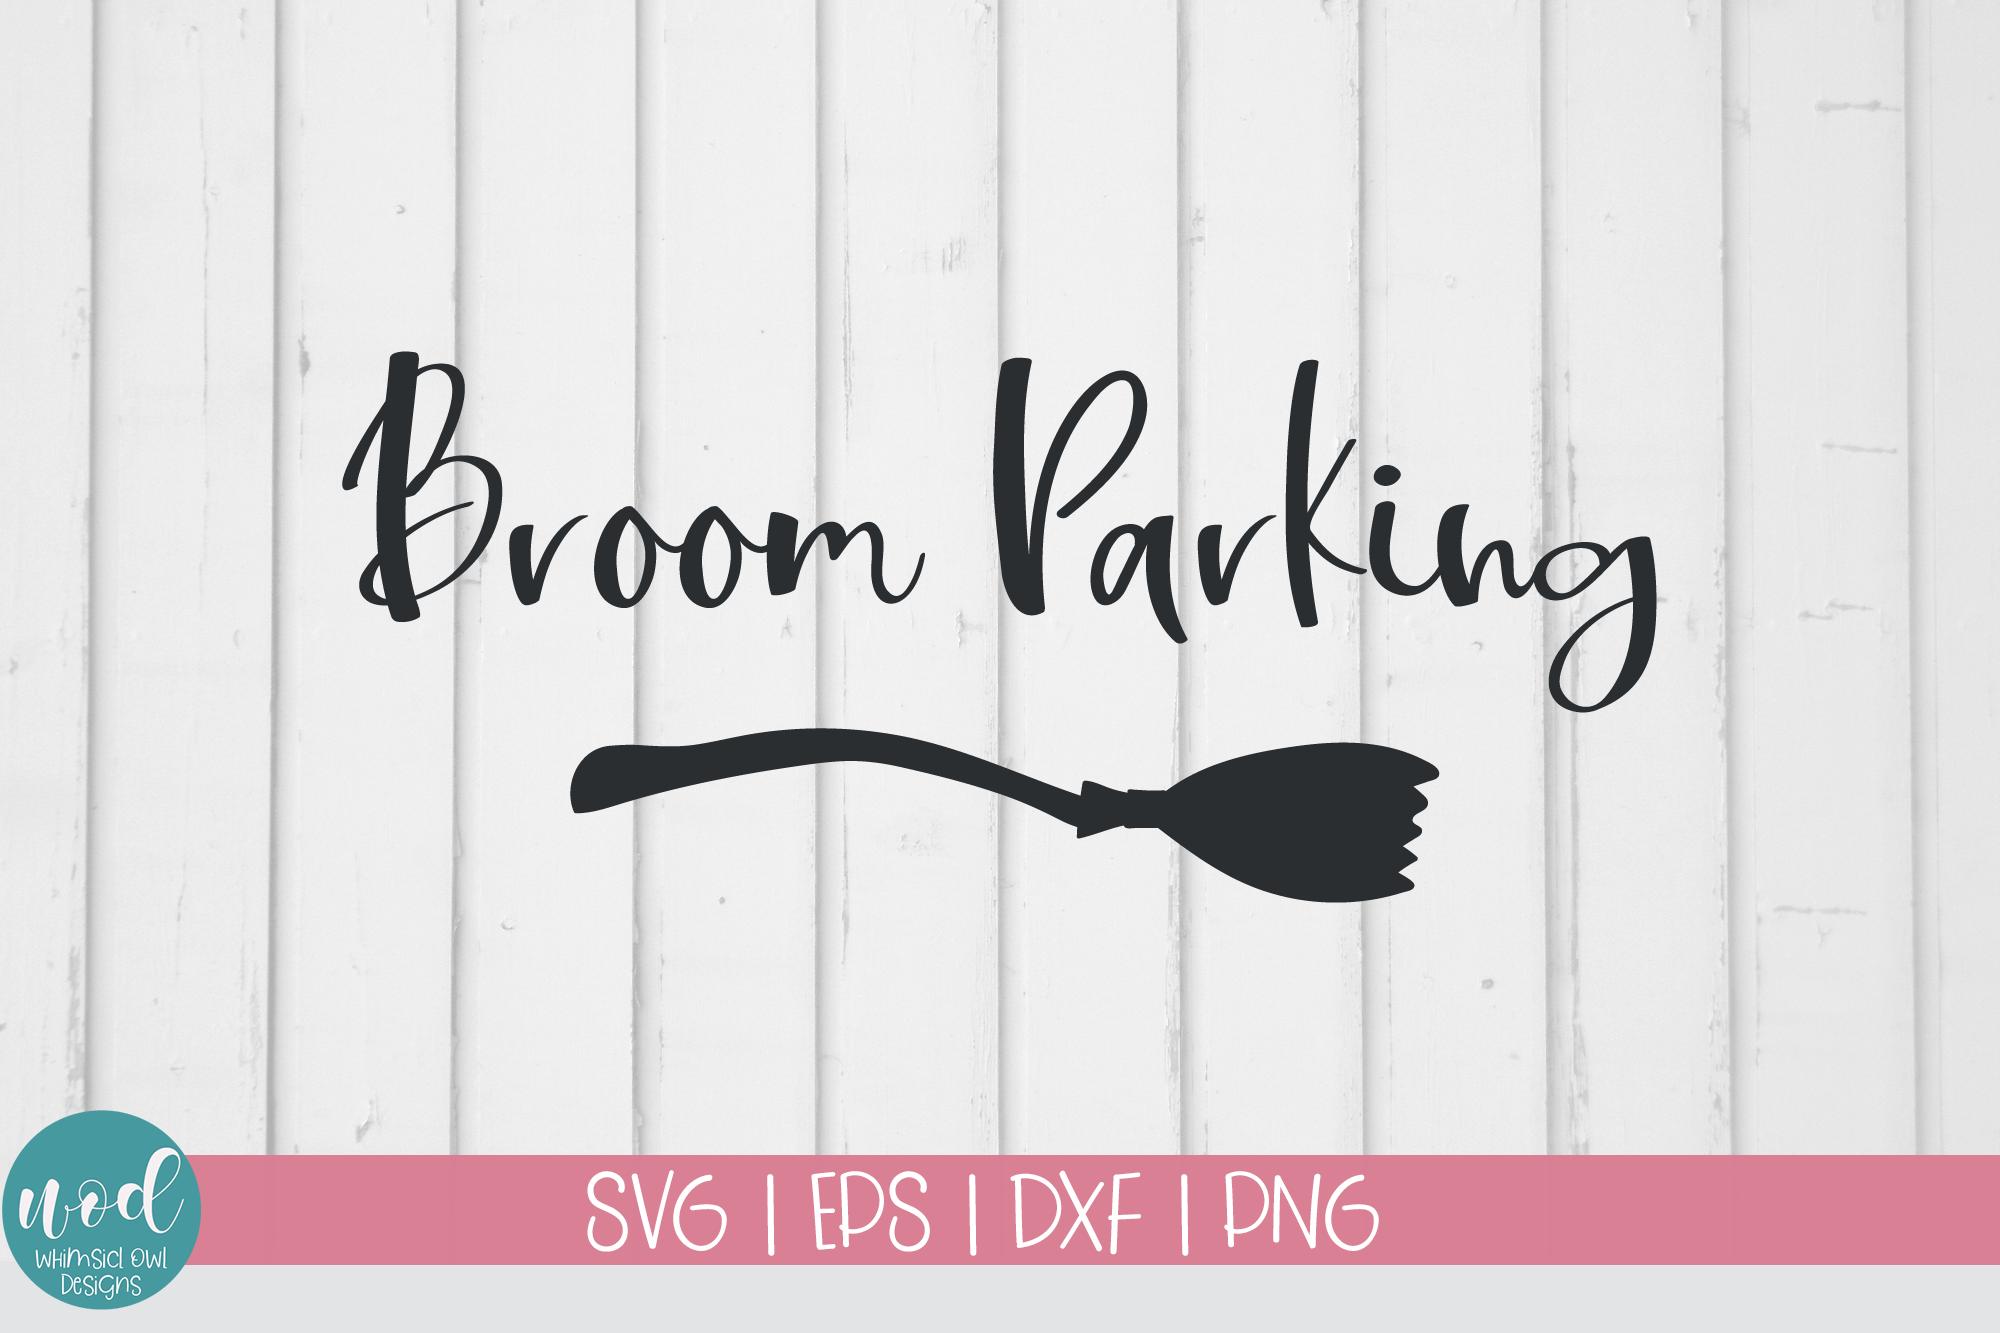 Broom Parking SVG File example image 1